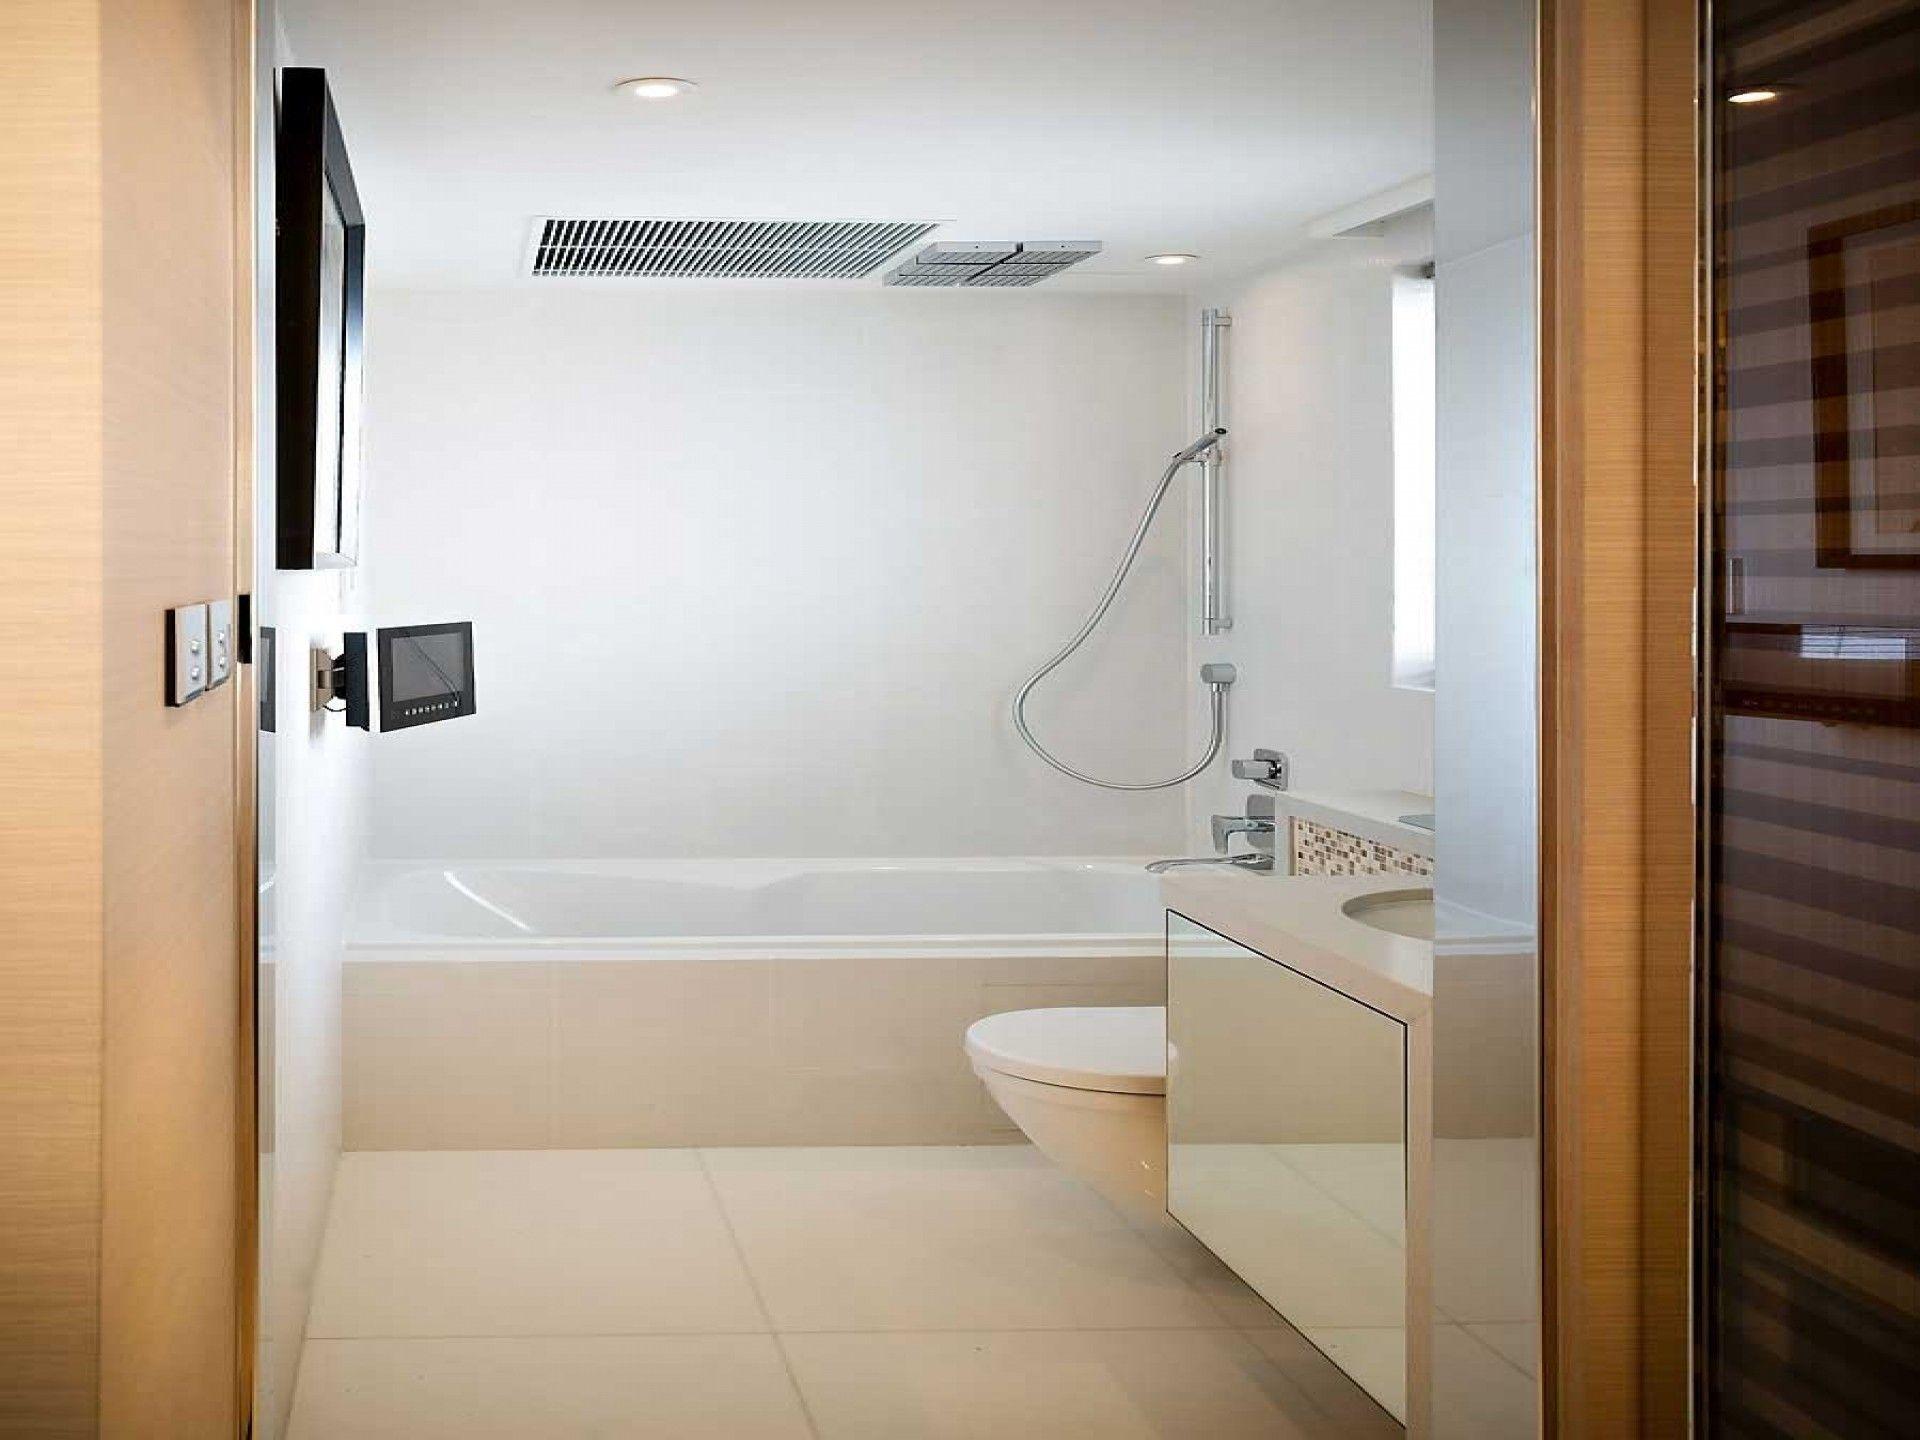 Beautiful Bathroom Tiles Designs Bathroom Tile Design Ideas For Small Bathrooms  Bathroom Pictures